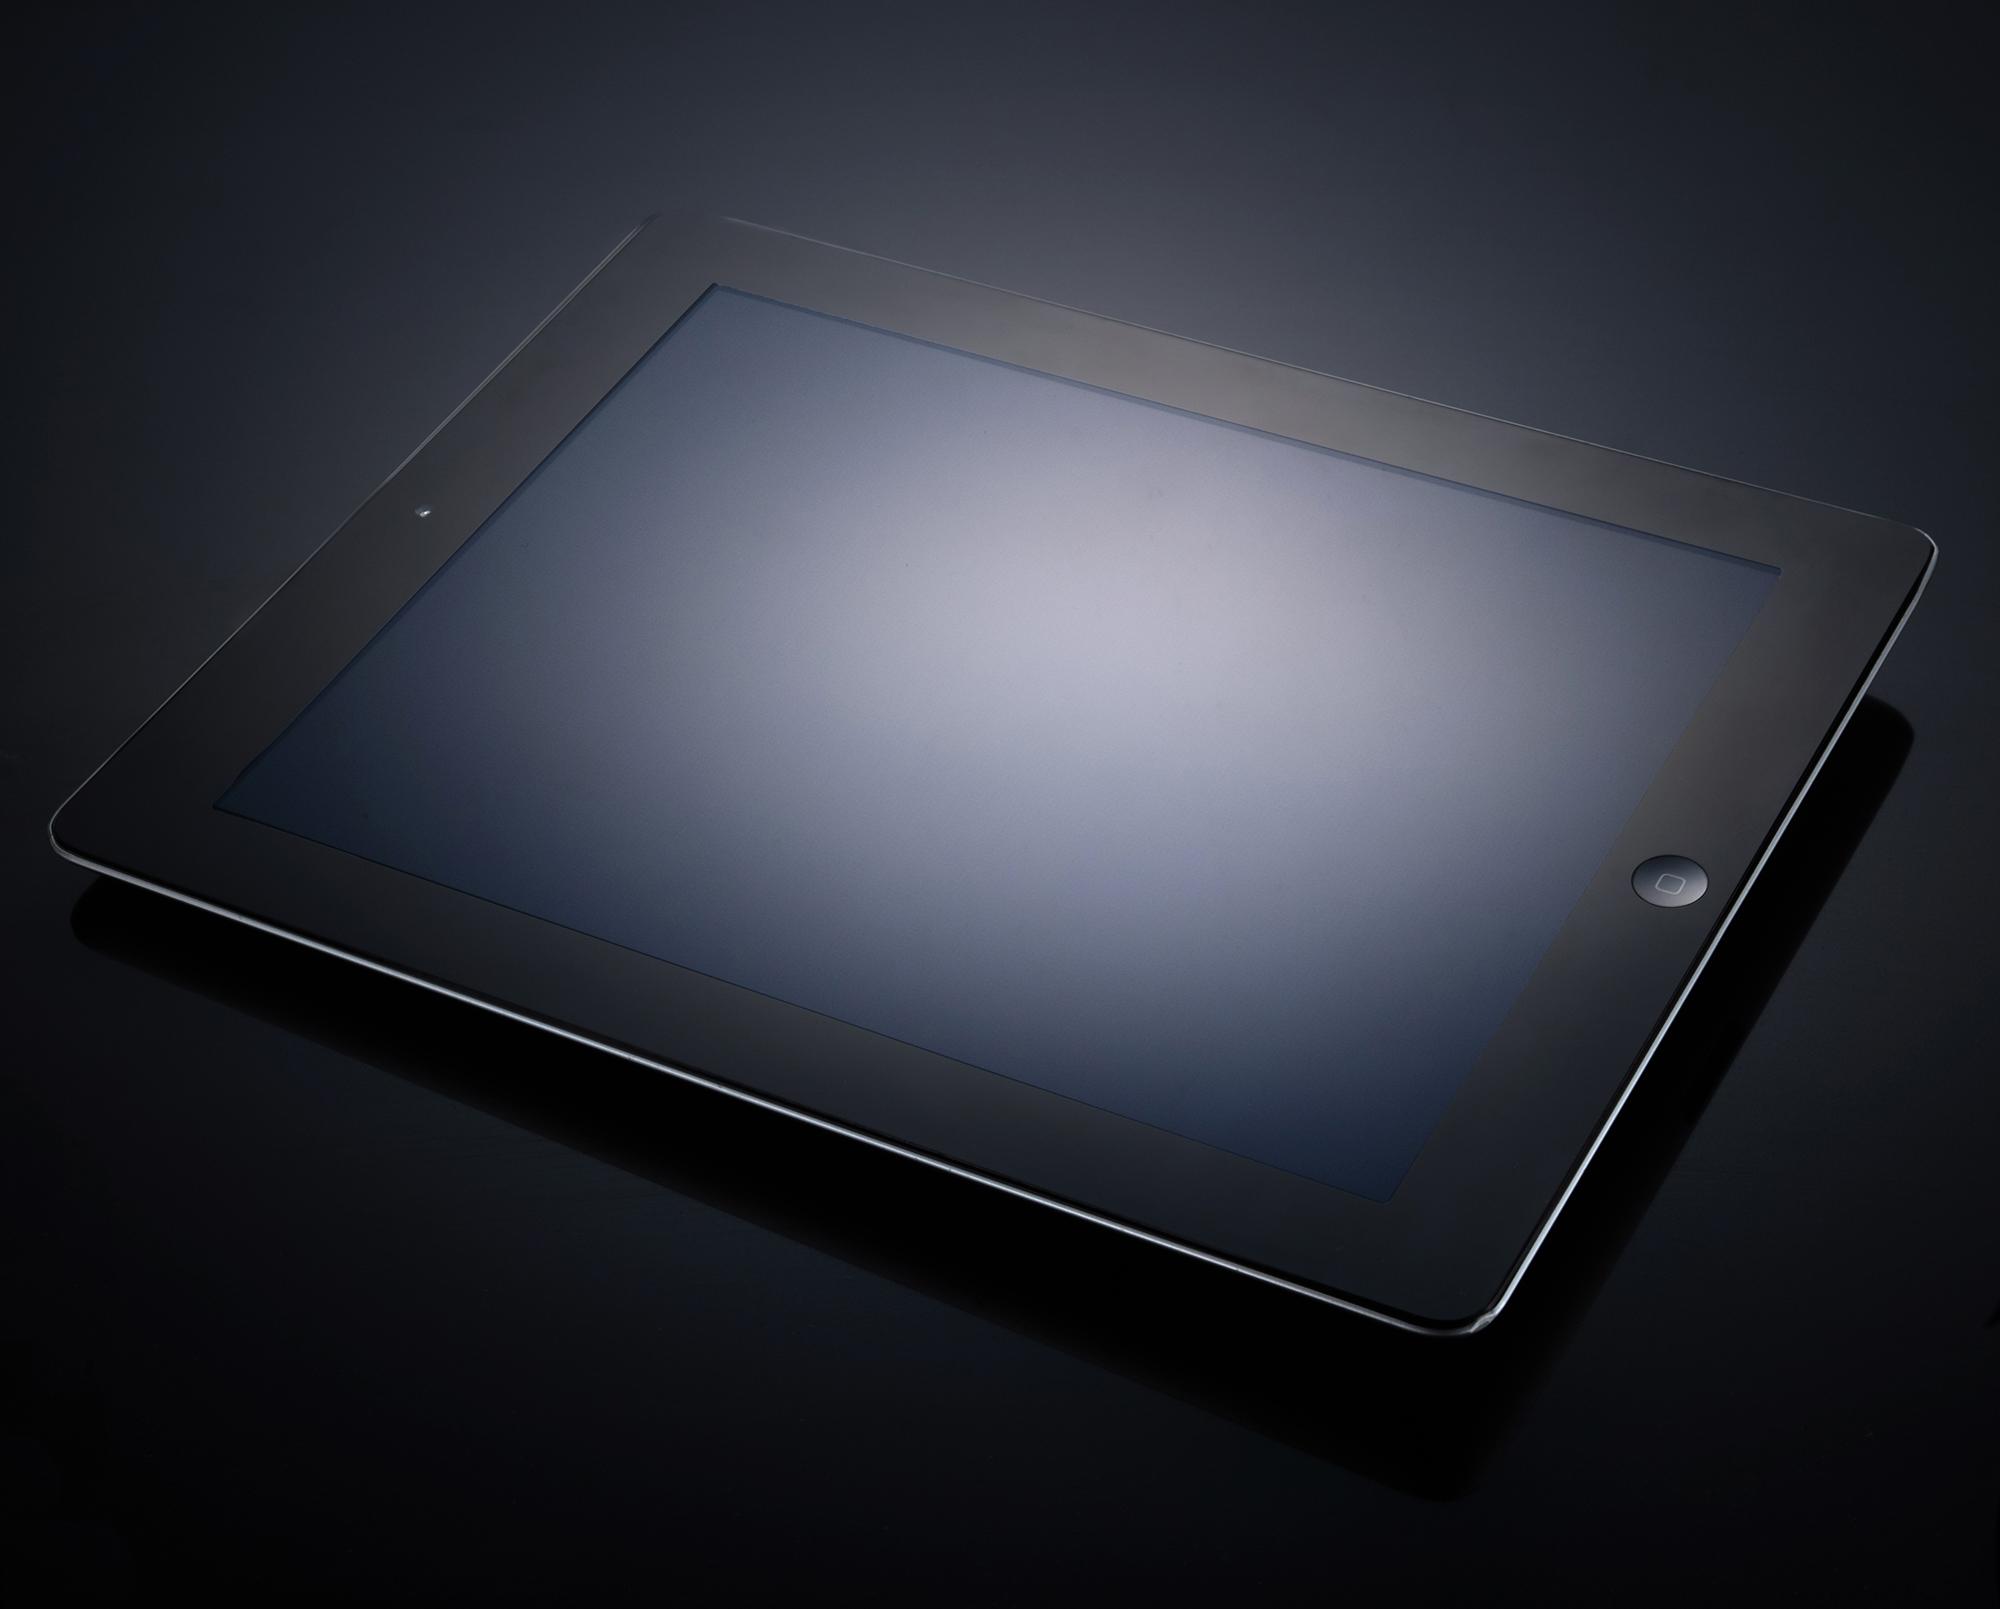 iPad Gradient Reflection